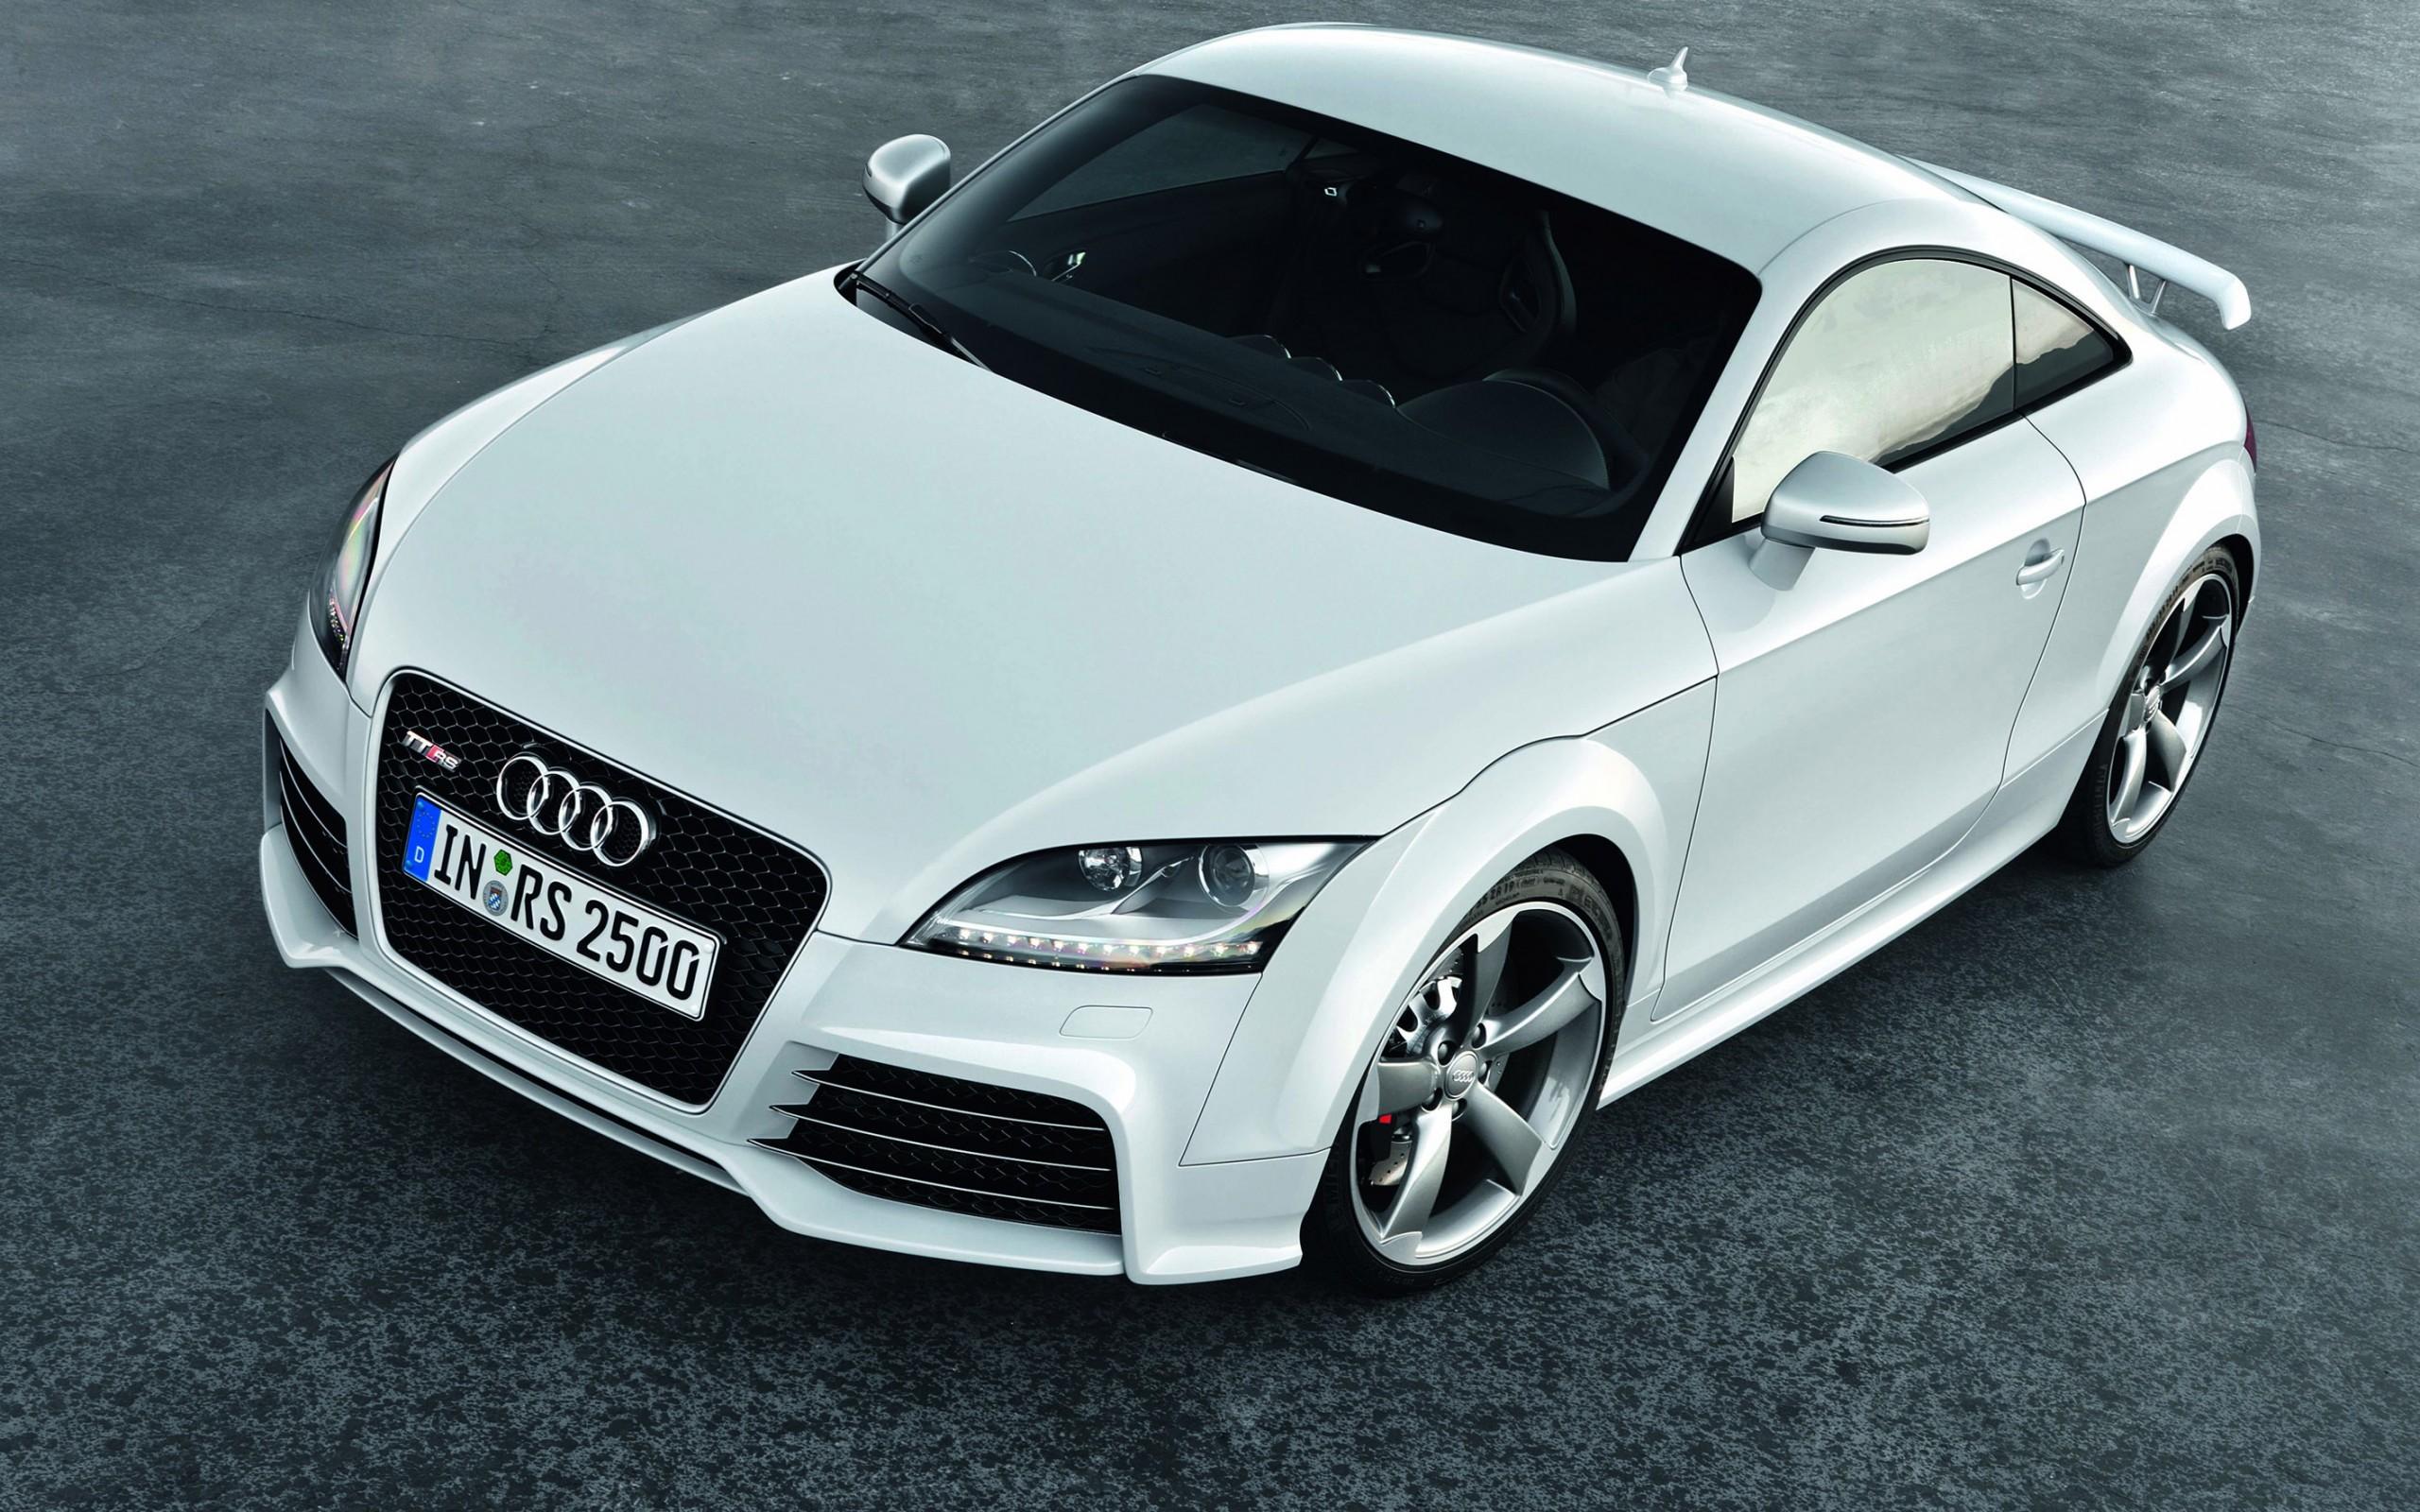 2012 Audi Tt Rs 20 HD Wallpaper